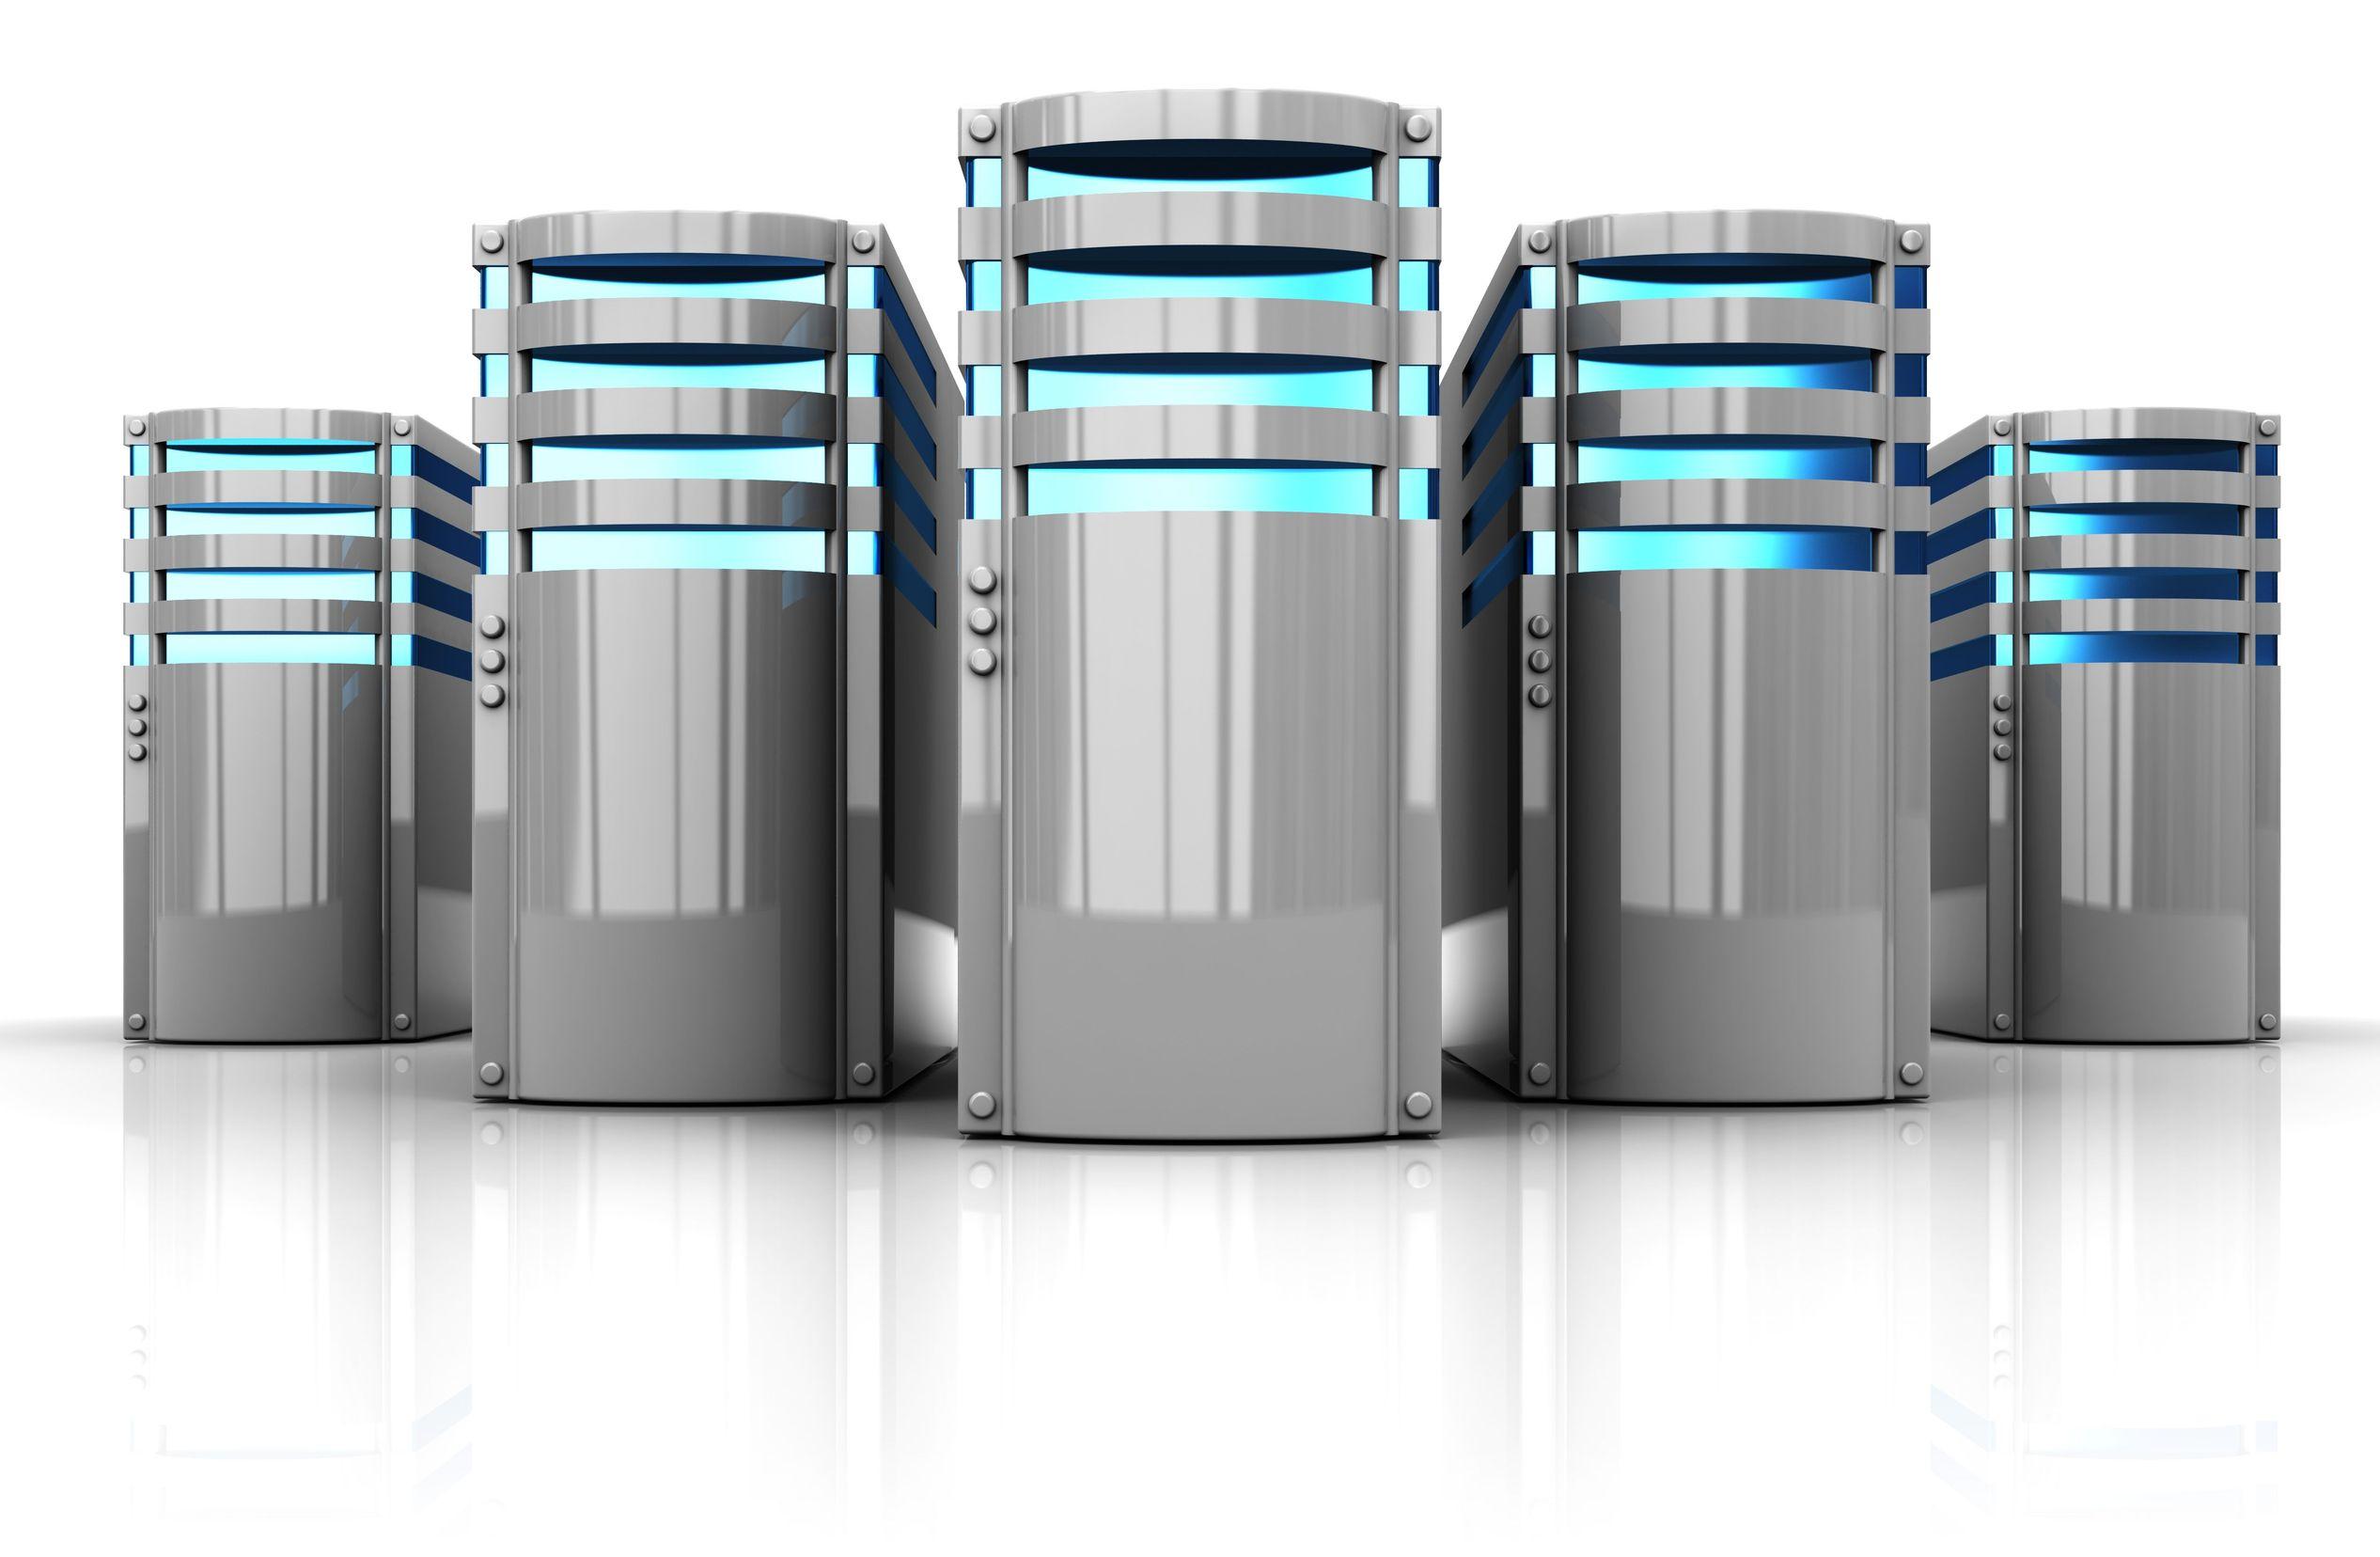 website host server